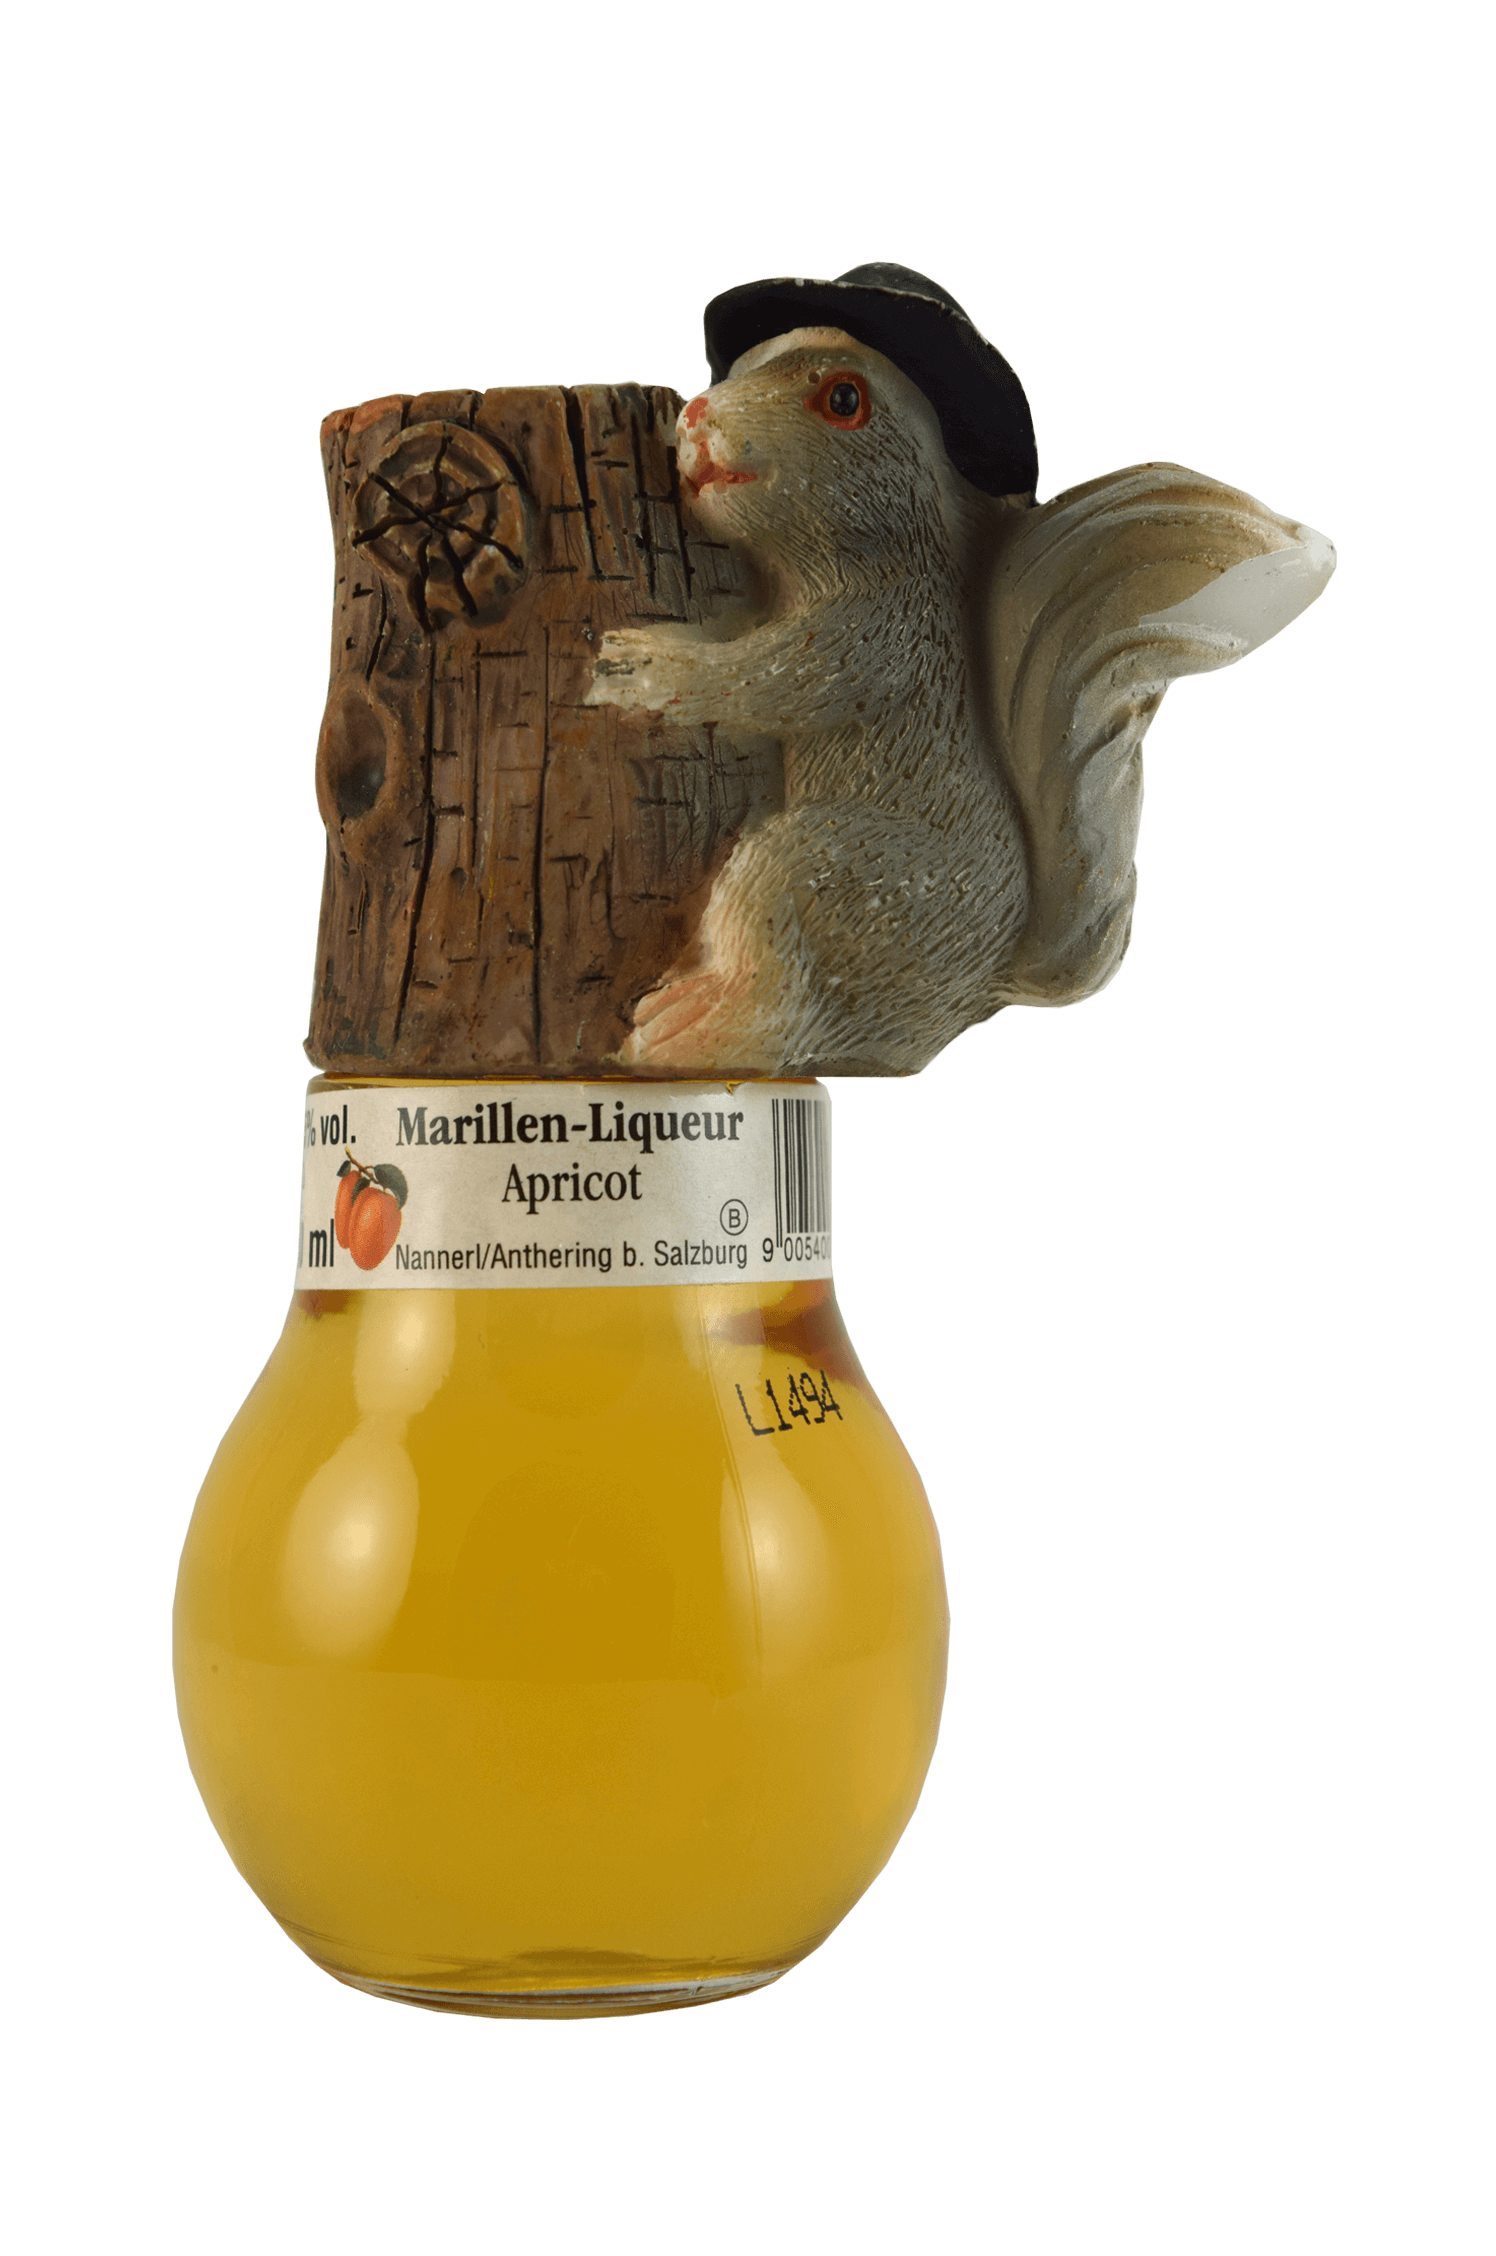 Marillen Liqueur Apricot